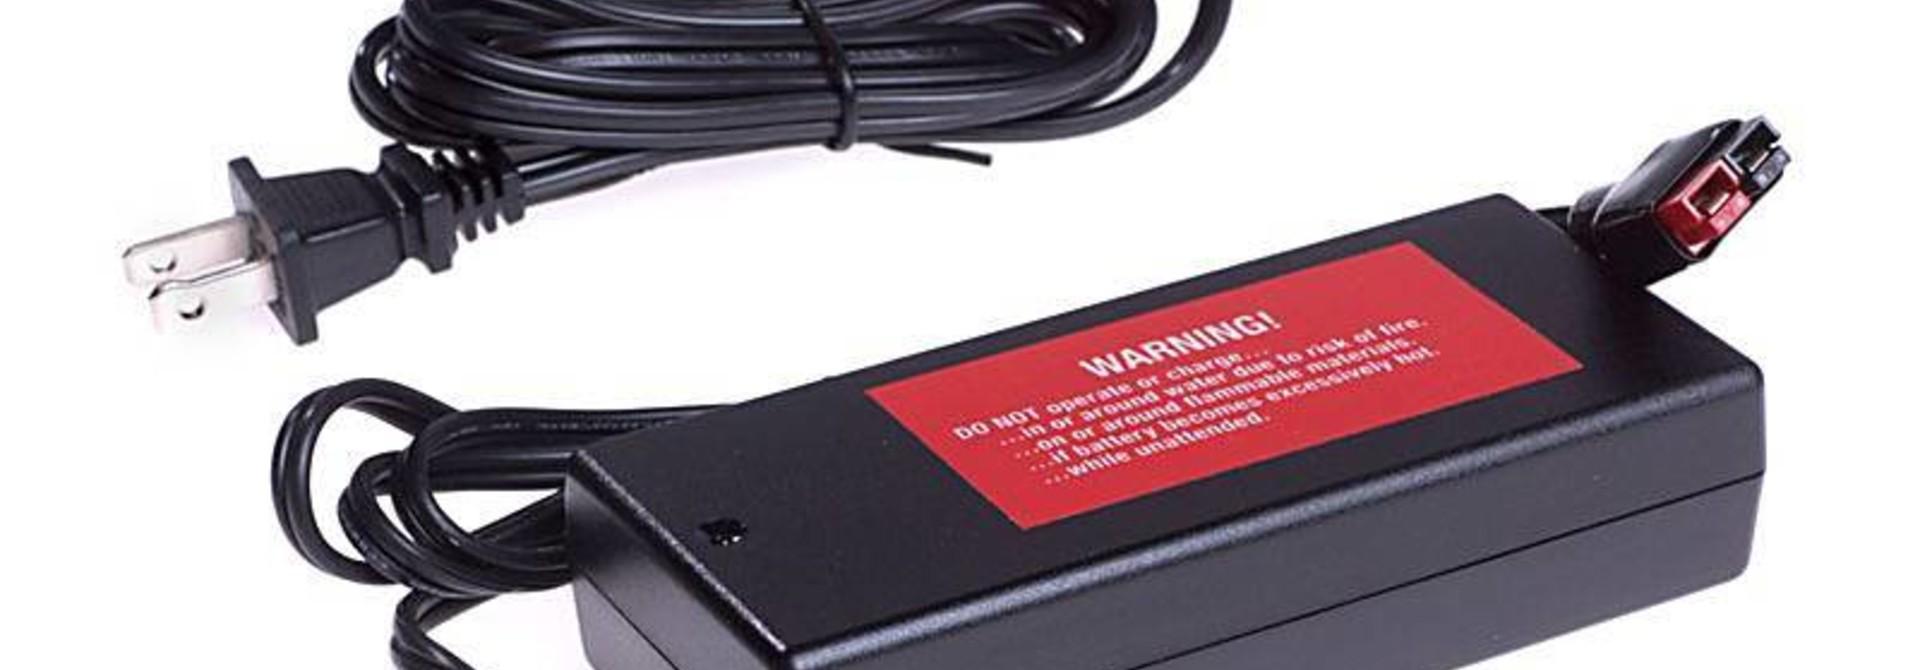 Vagabond Mini Lithium Battery Charger